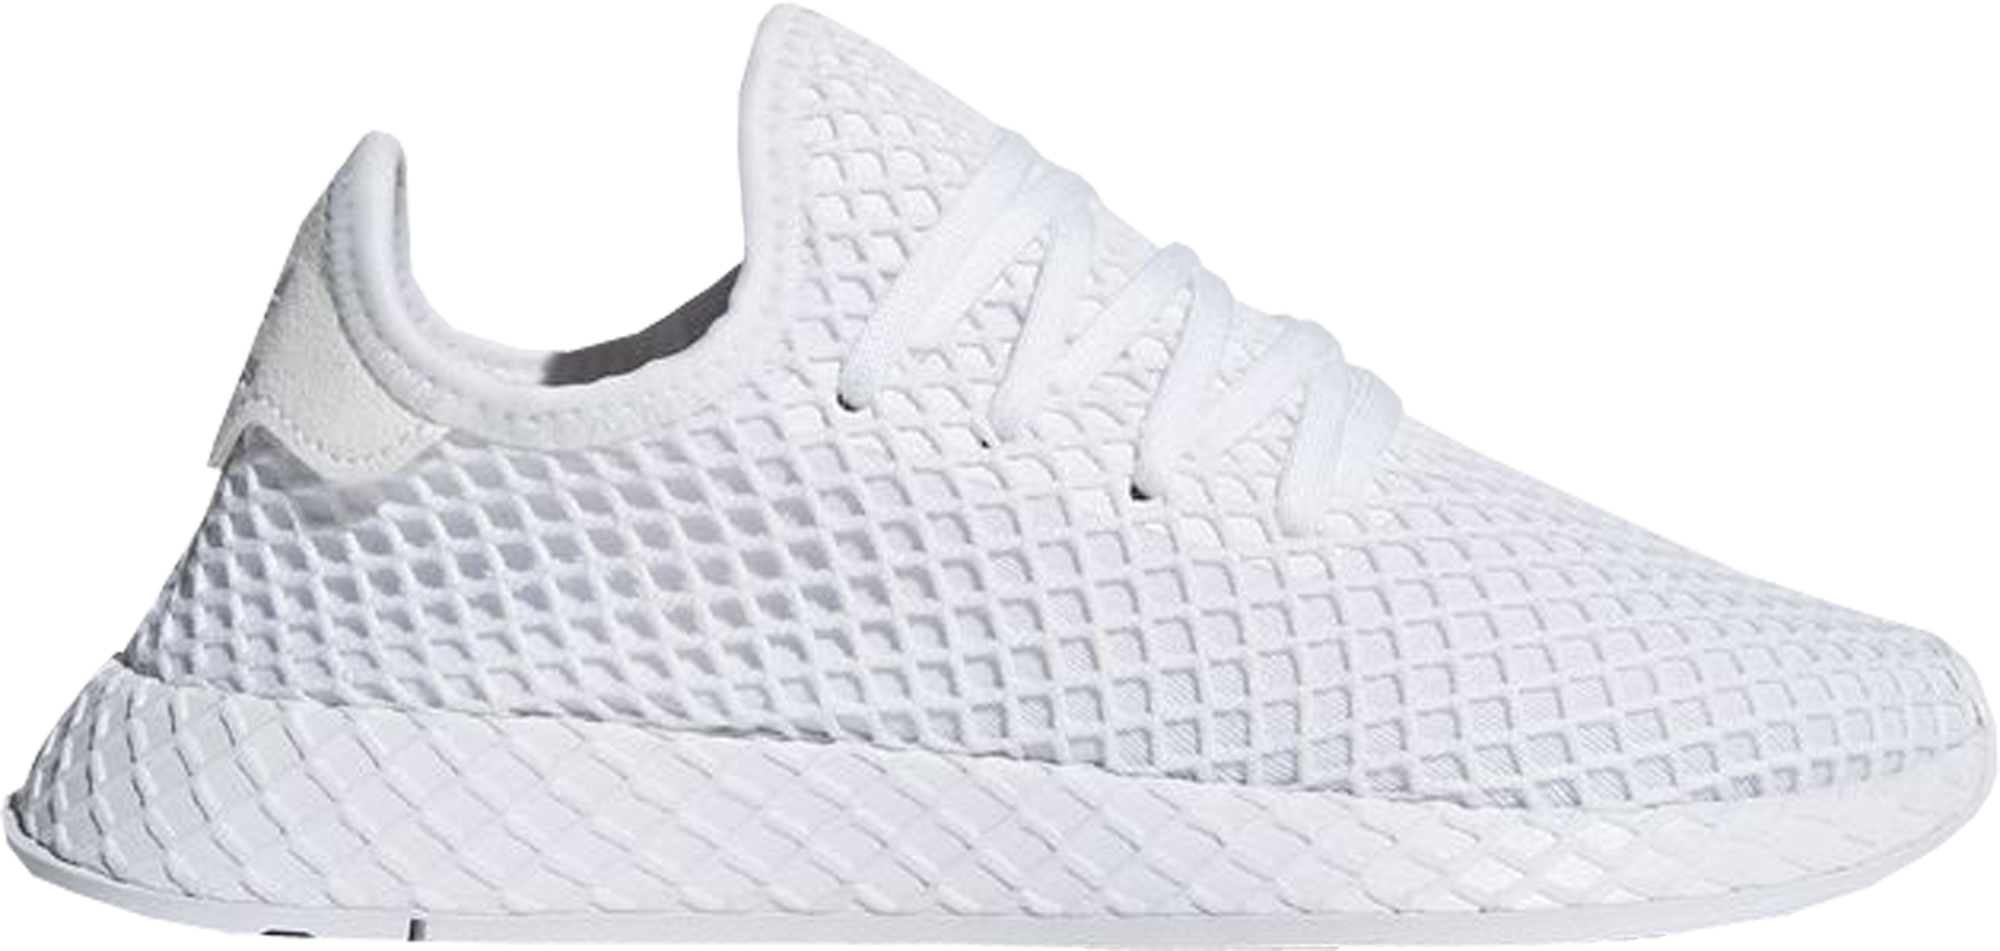 adidas Deerupt Triple White (GS)